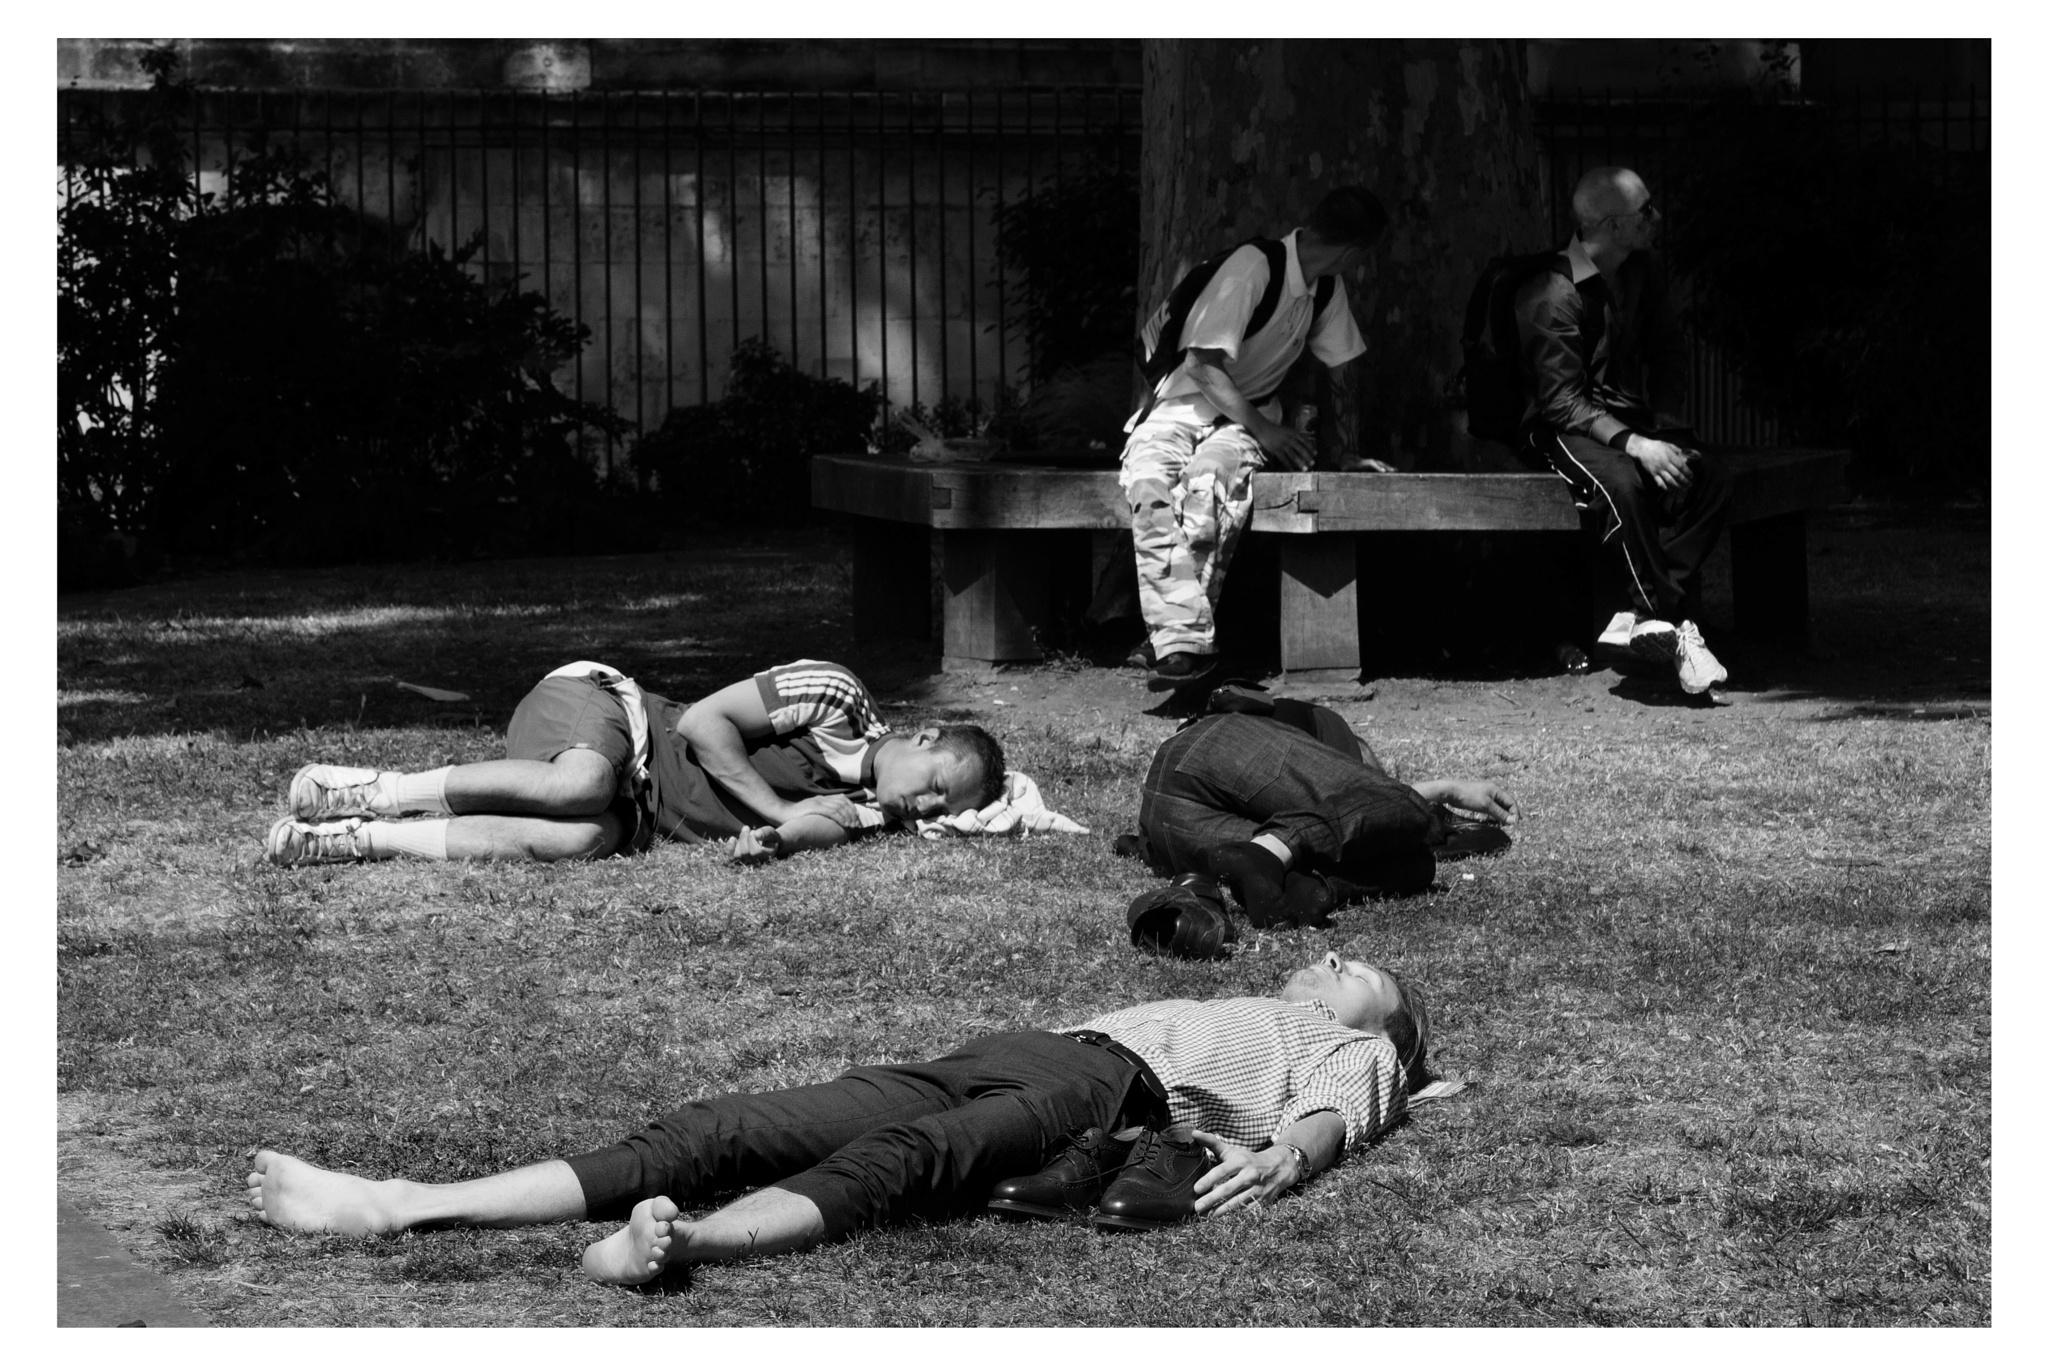 On Grass by Jeff Hubbard